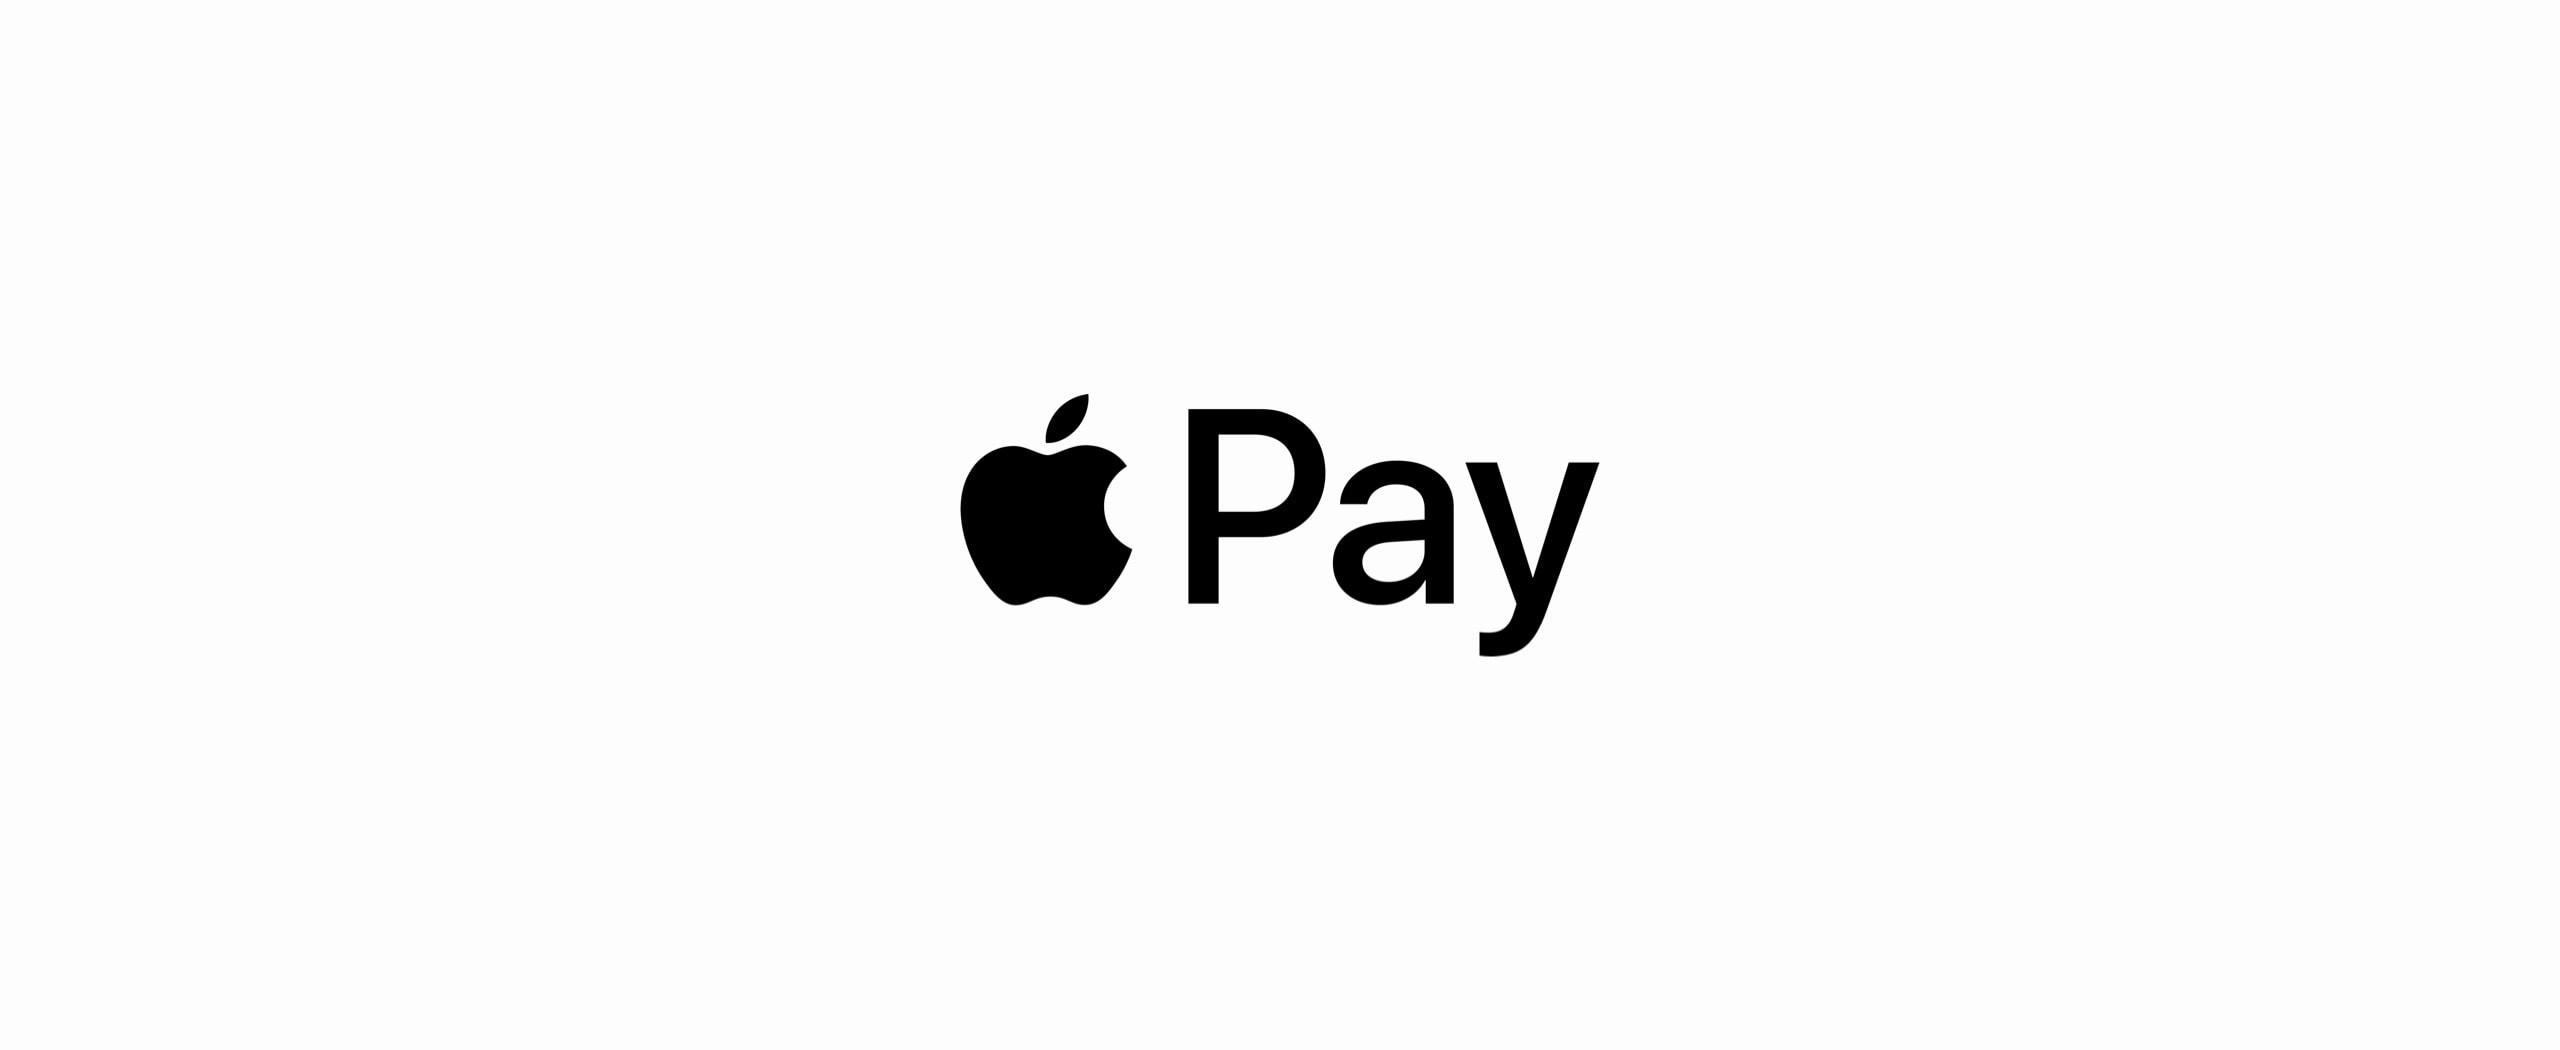 Apple Pay logo.